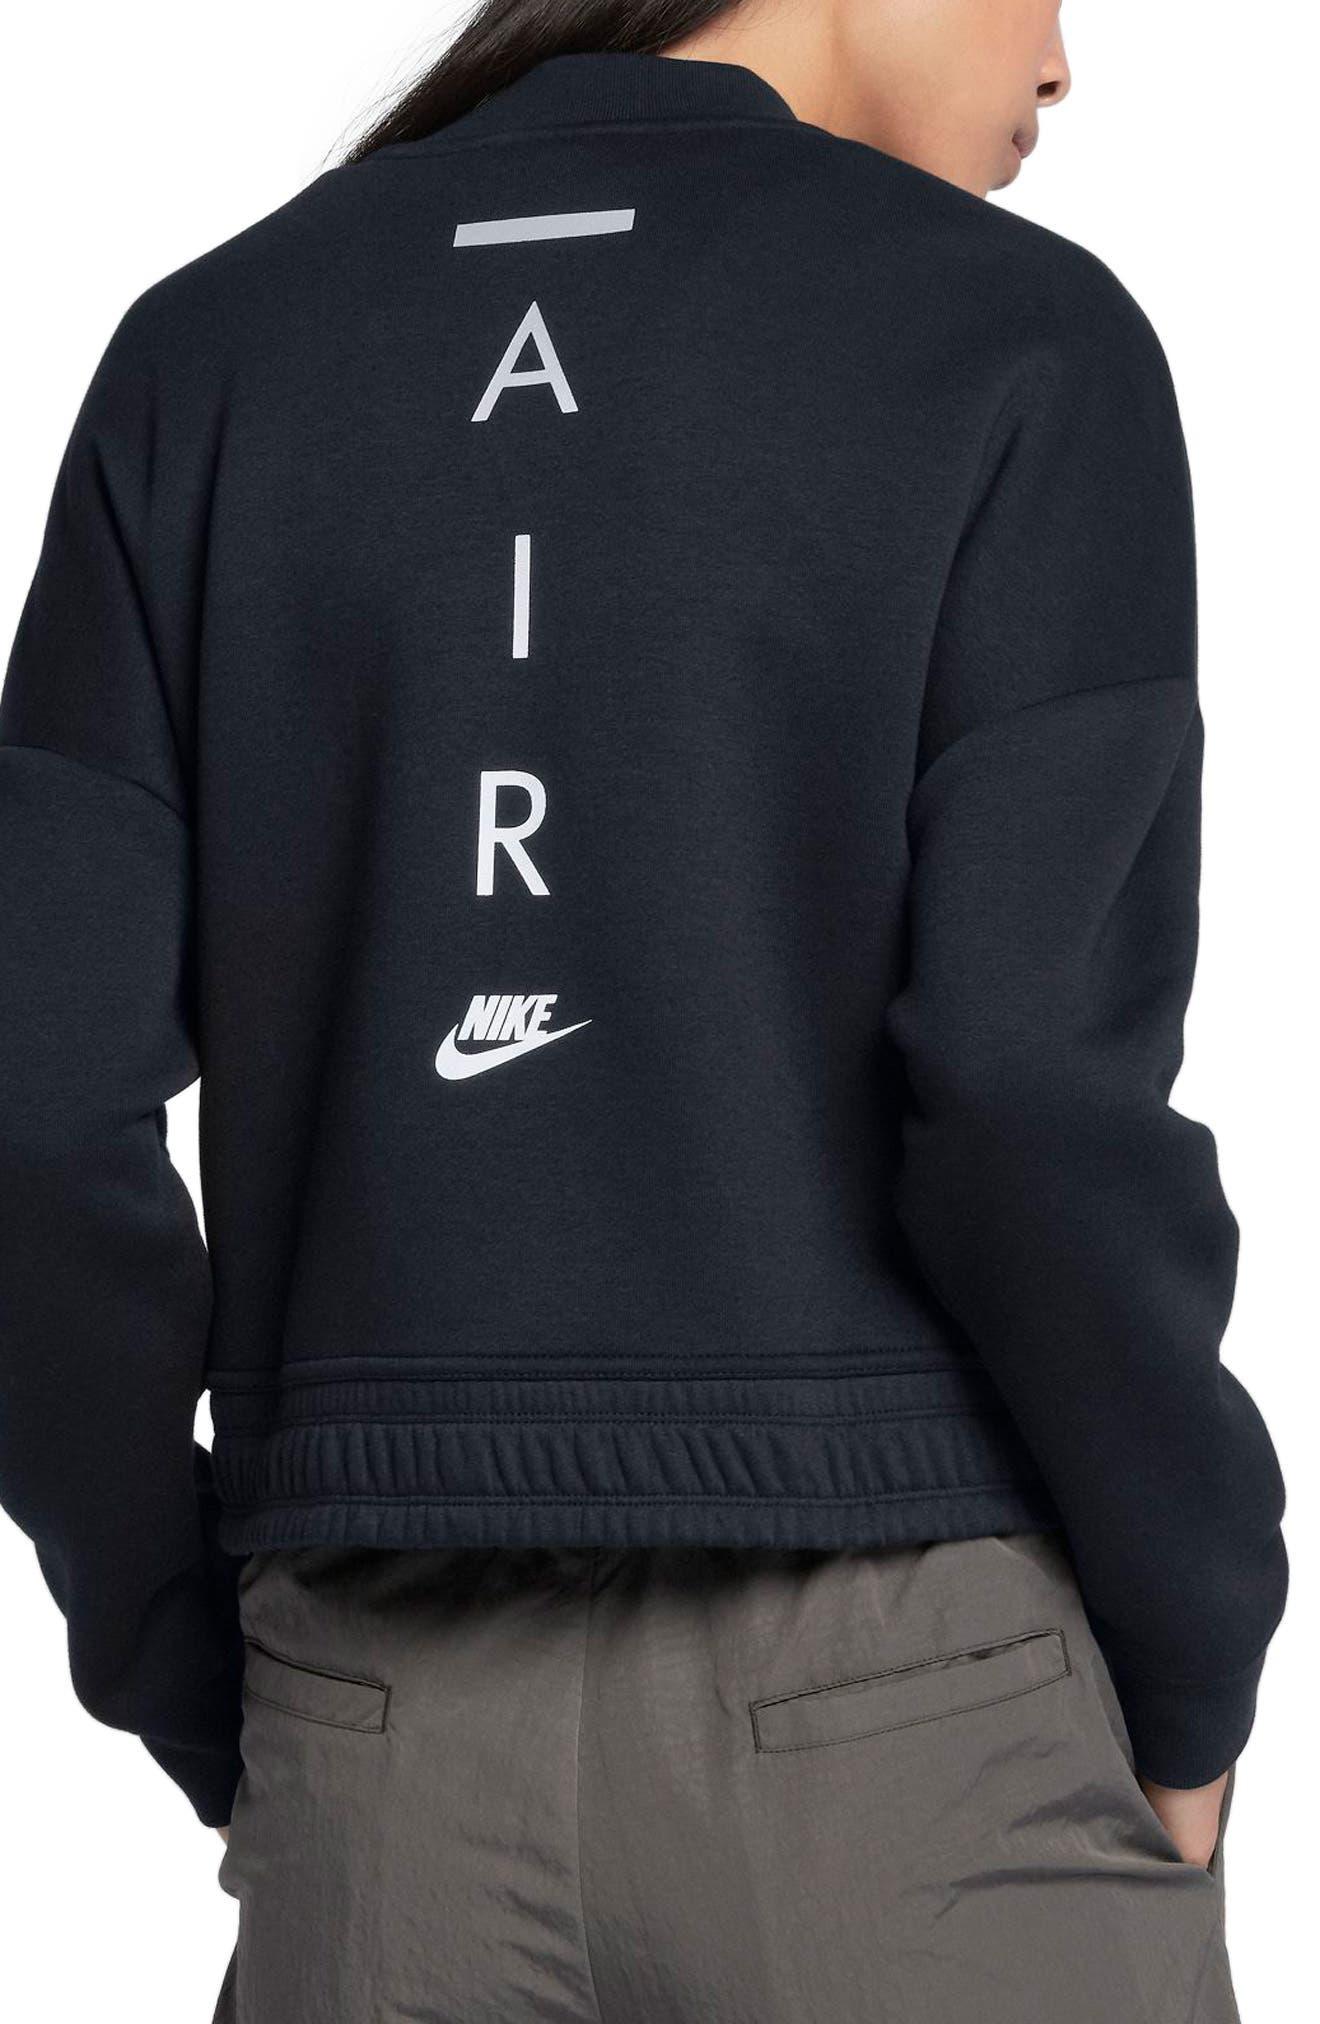 Sportswear Rally Jacket,                             Alternate thumbnail 2, color,                             Black/ Black/ Black